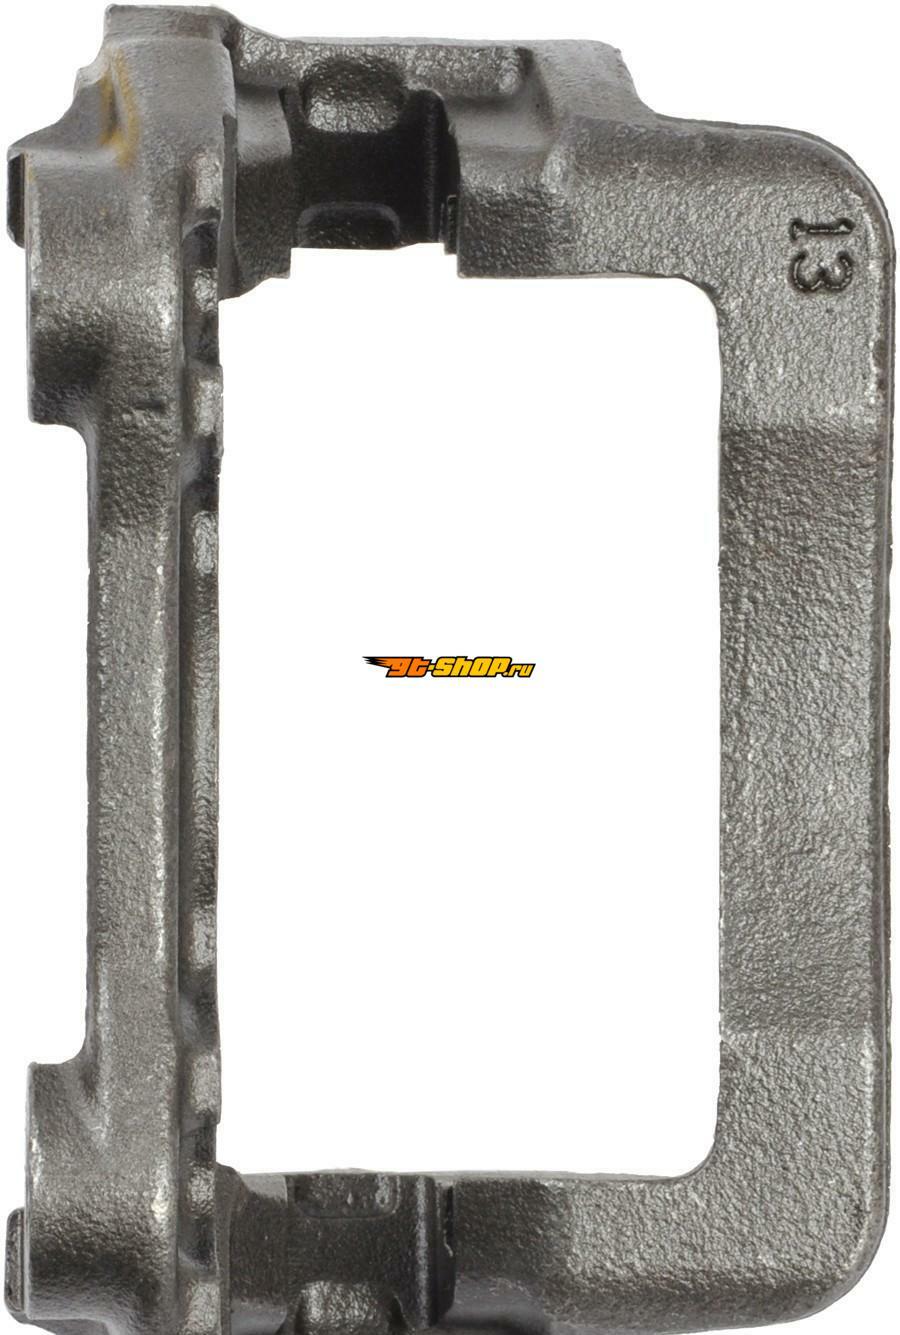 A-1 CARDONE 141434